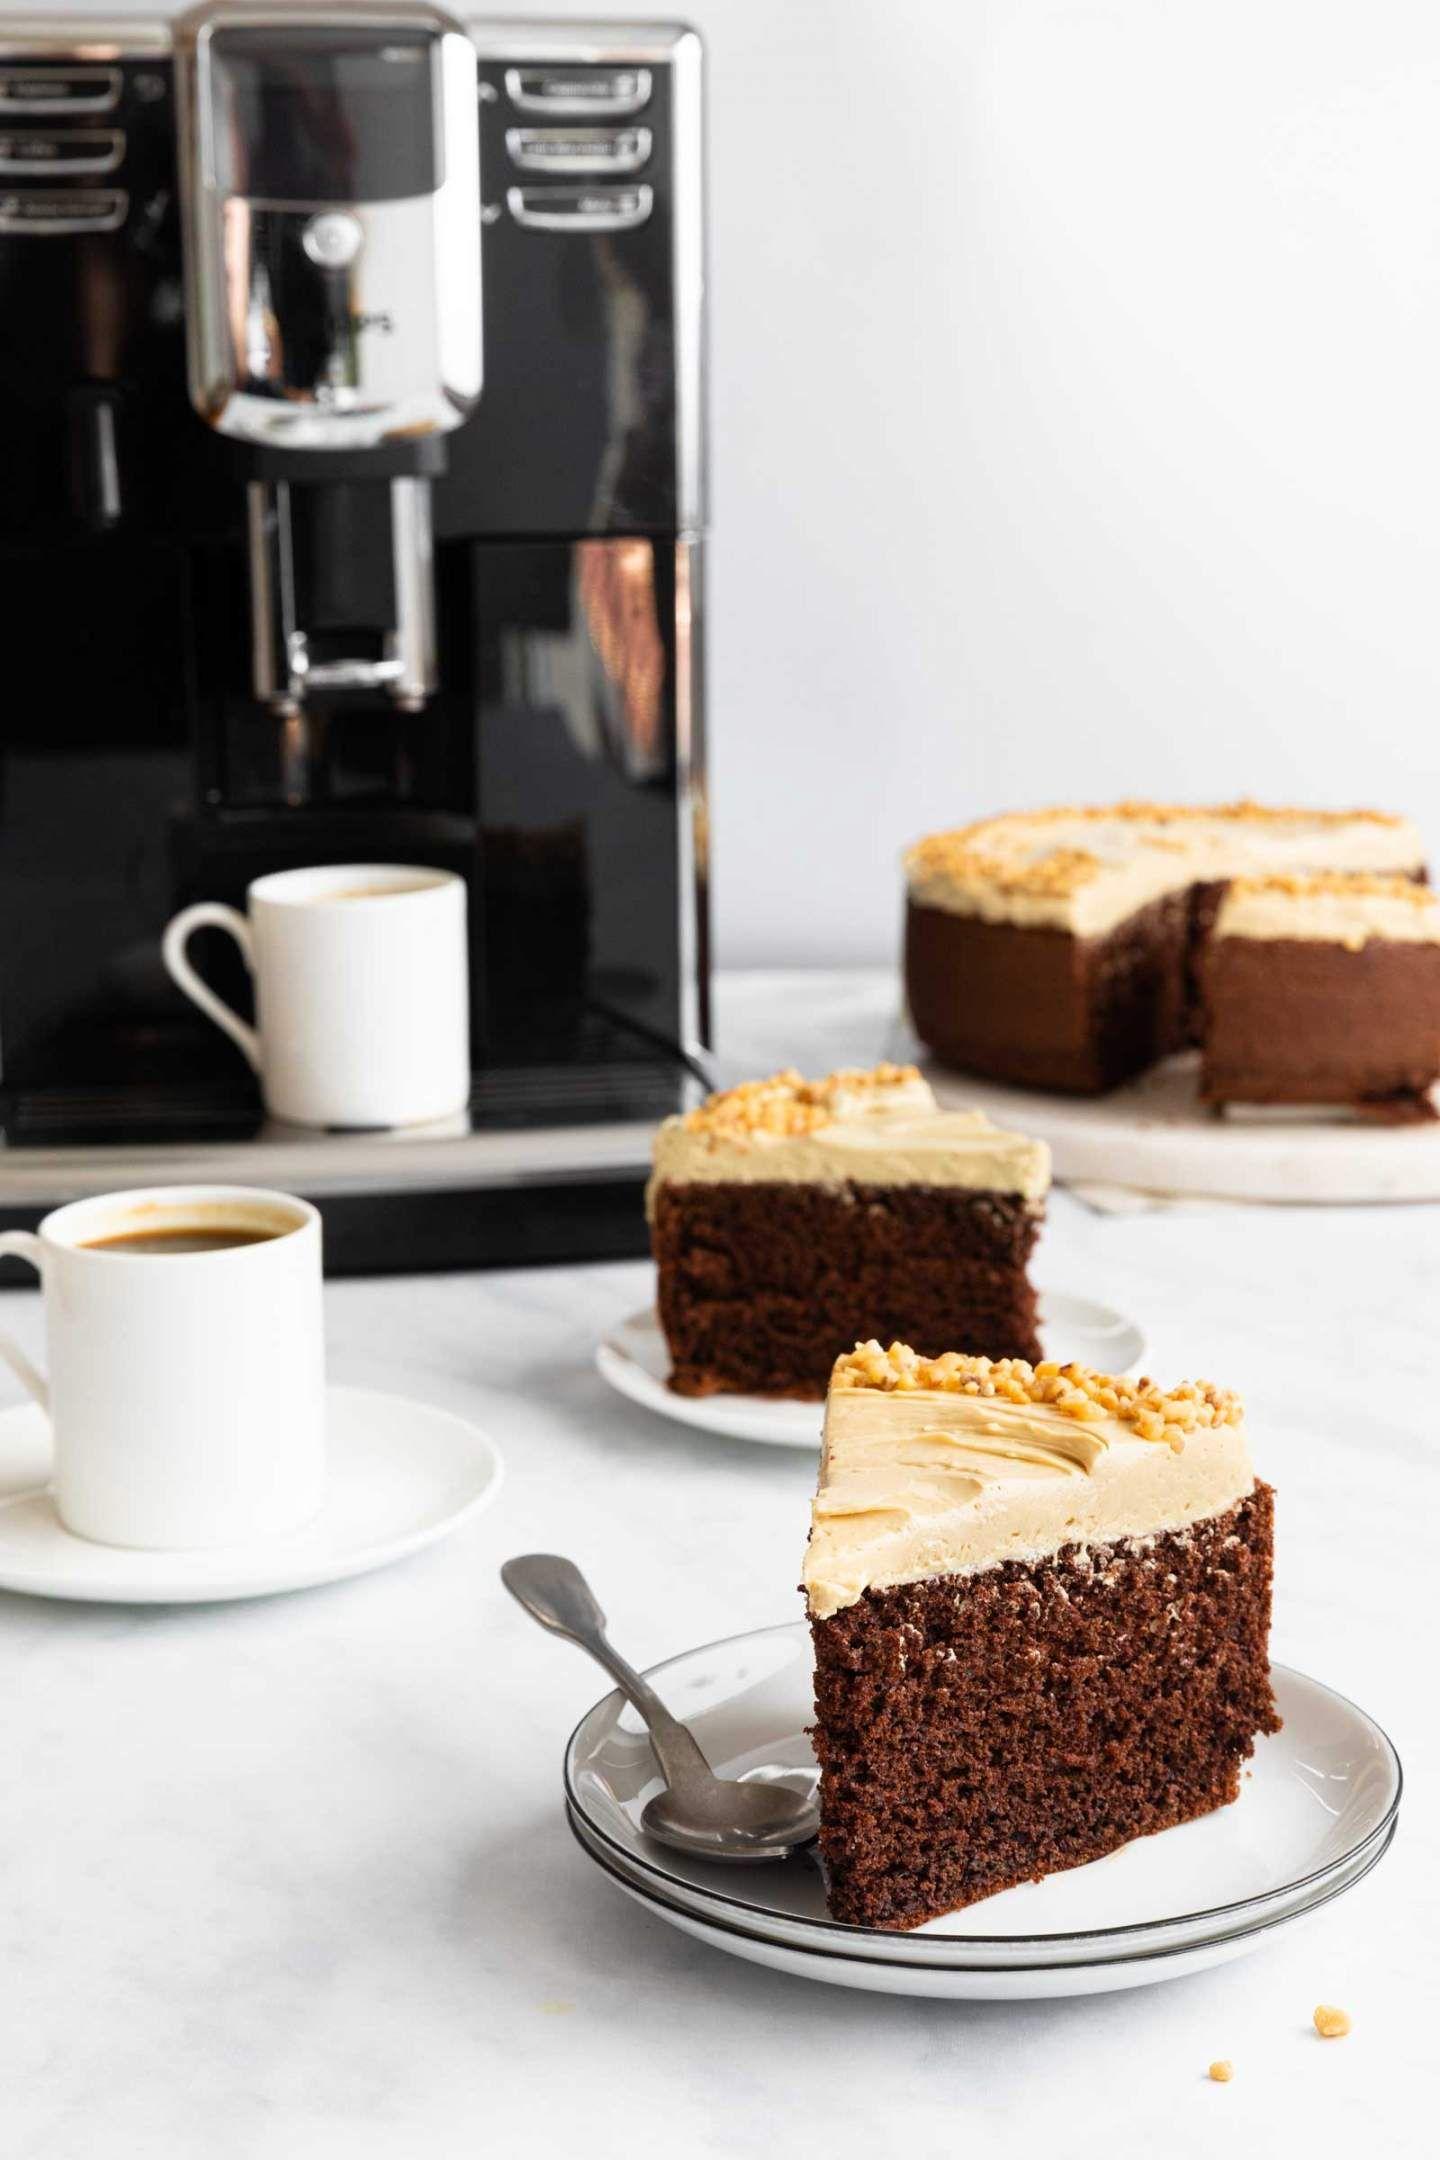 Simple Espresso Cake Recipe in 2020 Espresso cake